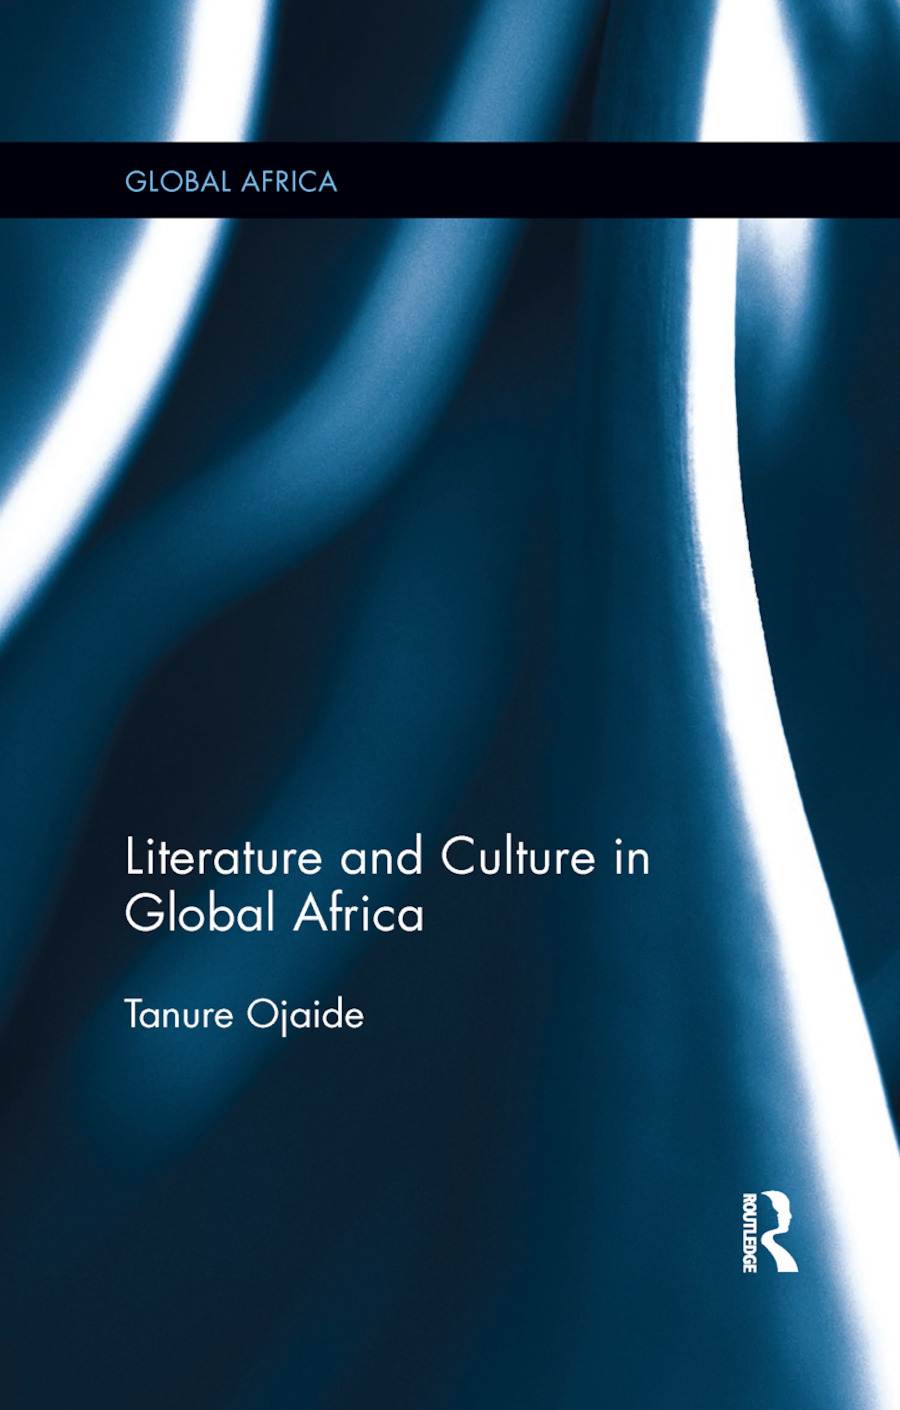 Literature and Culture in Global Africa book cover